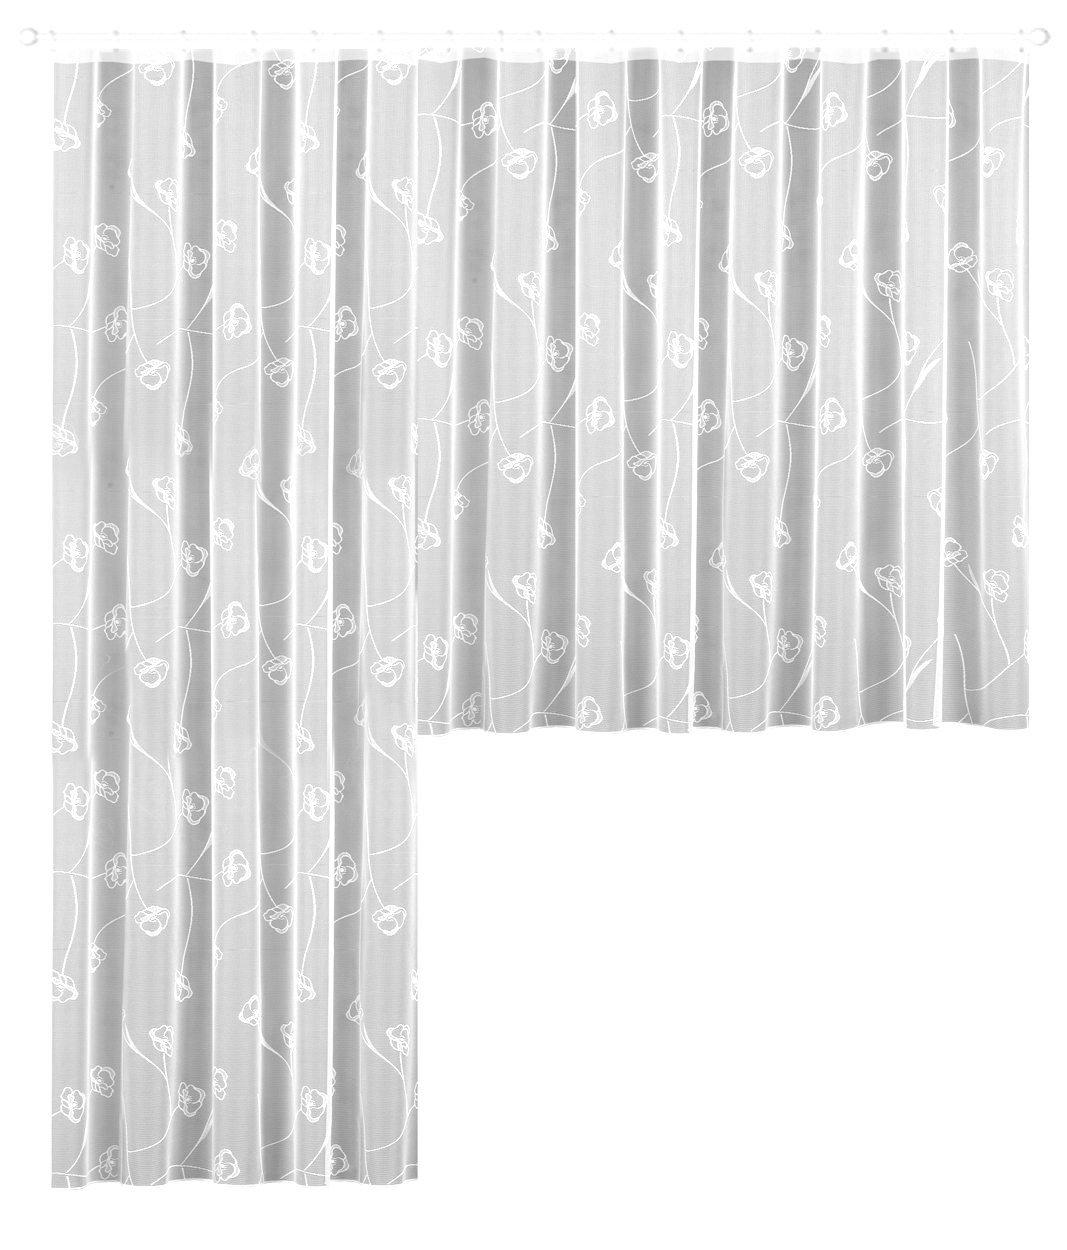 vorhnge aufhngen fenster urbansteel gardinen dekostoffe vorhang with vorhnge aufhngen vorhang. Black Bedroom Furniture Sets. Home Design Ideas